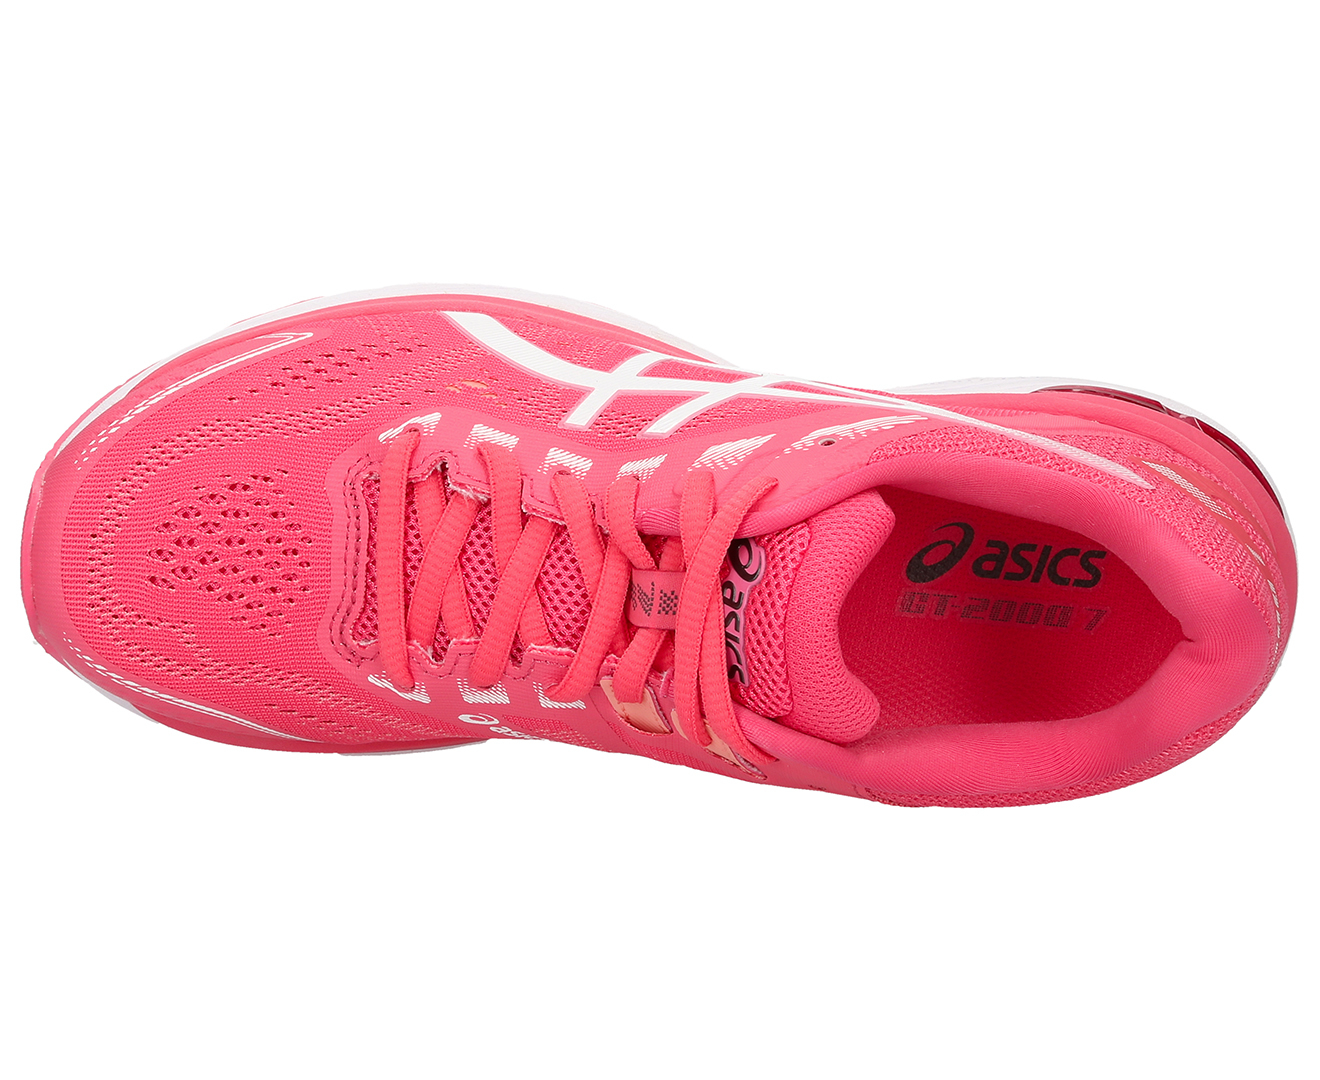 eb95084c84 ASICS Women's GT-2000 7 Shoe - Pink Cameo/White   Catch.com.au